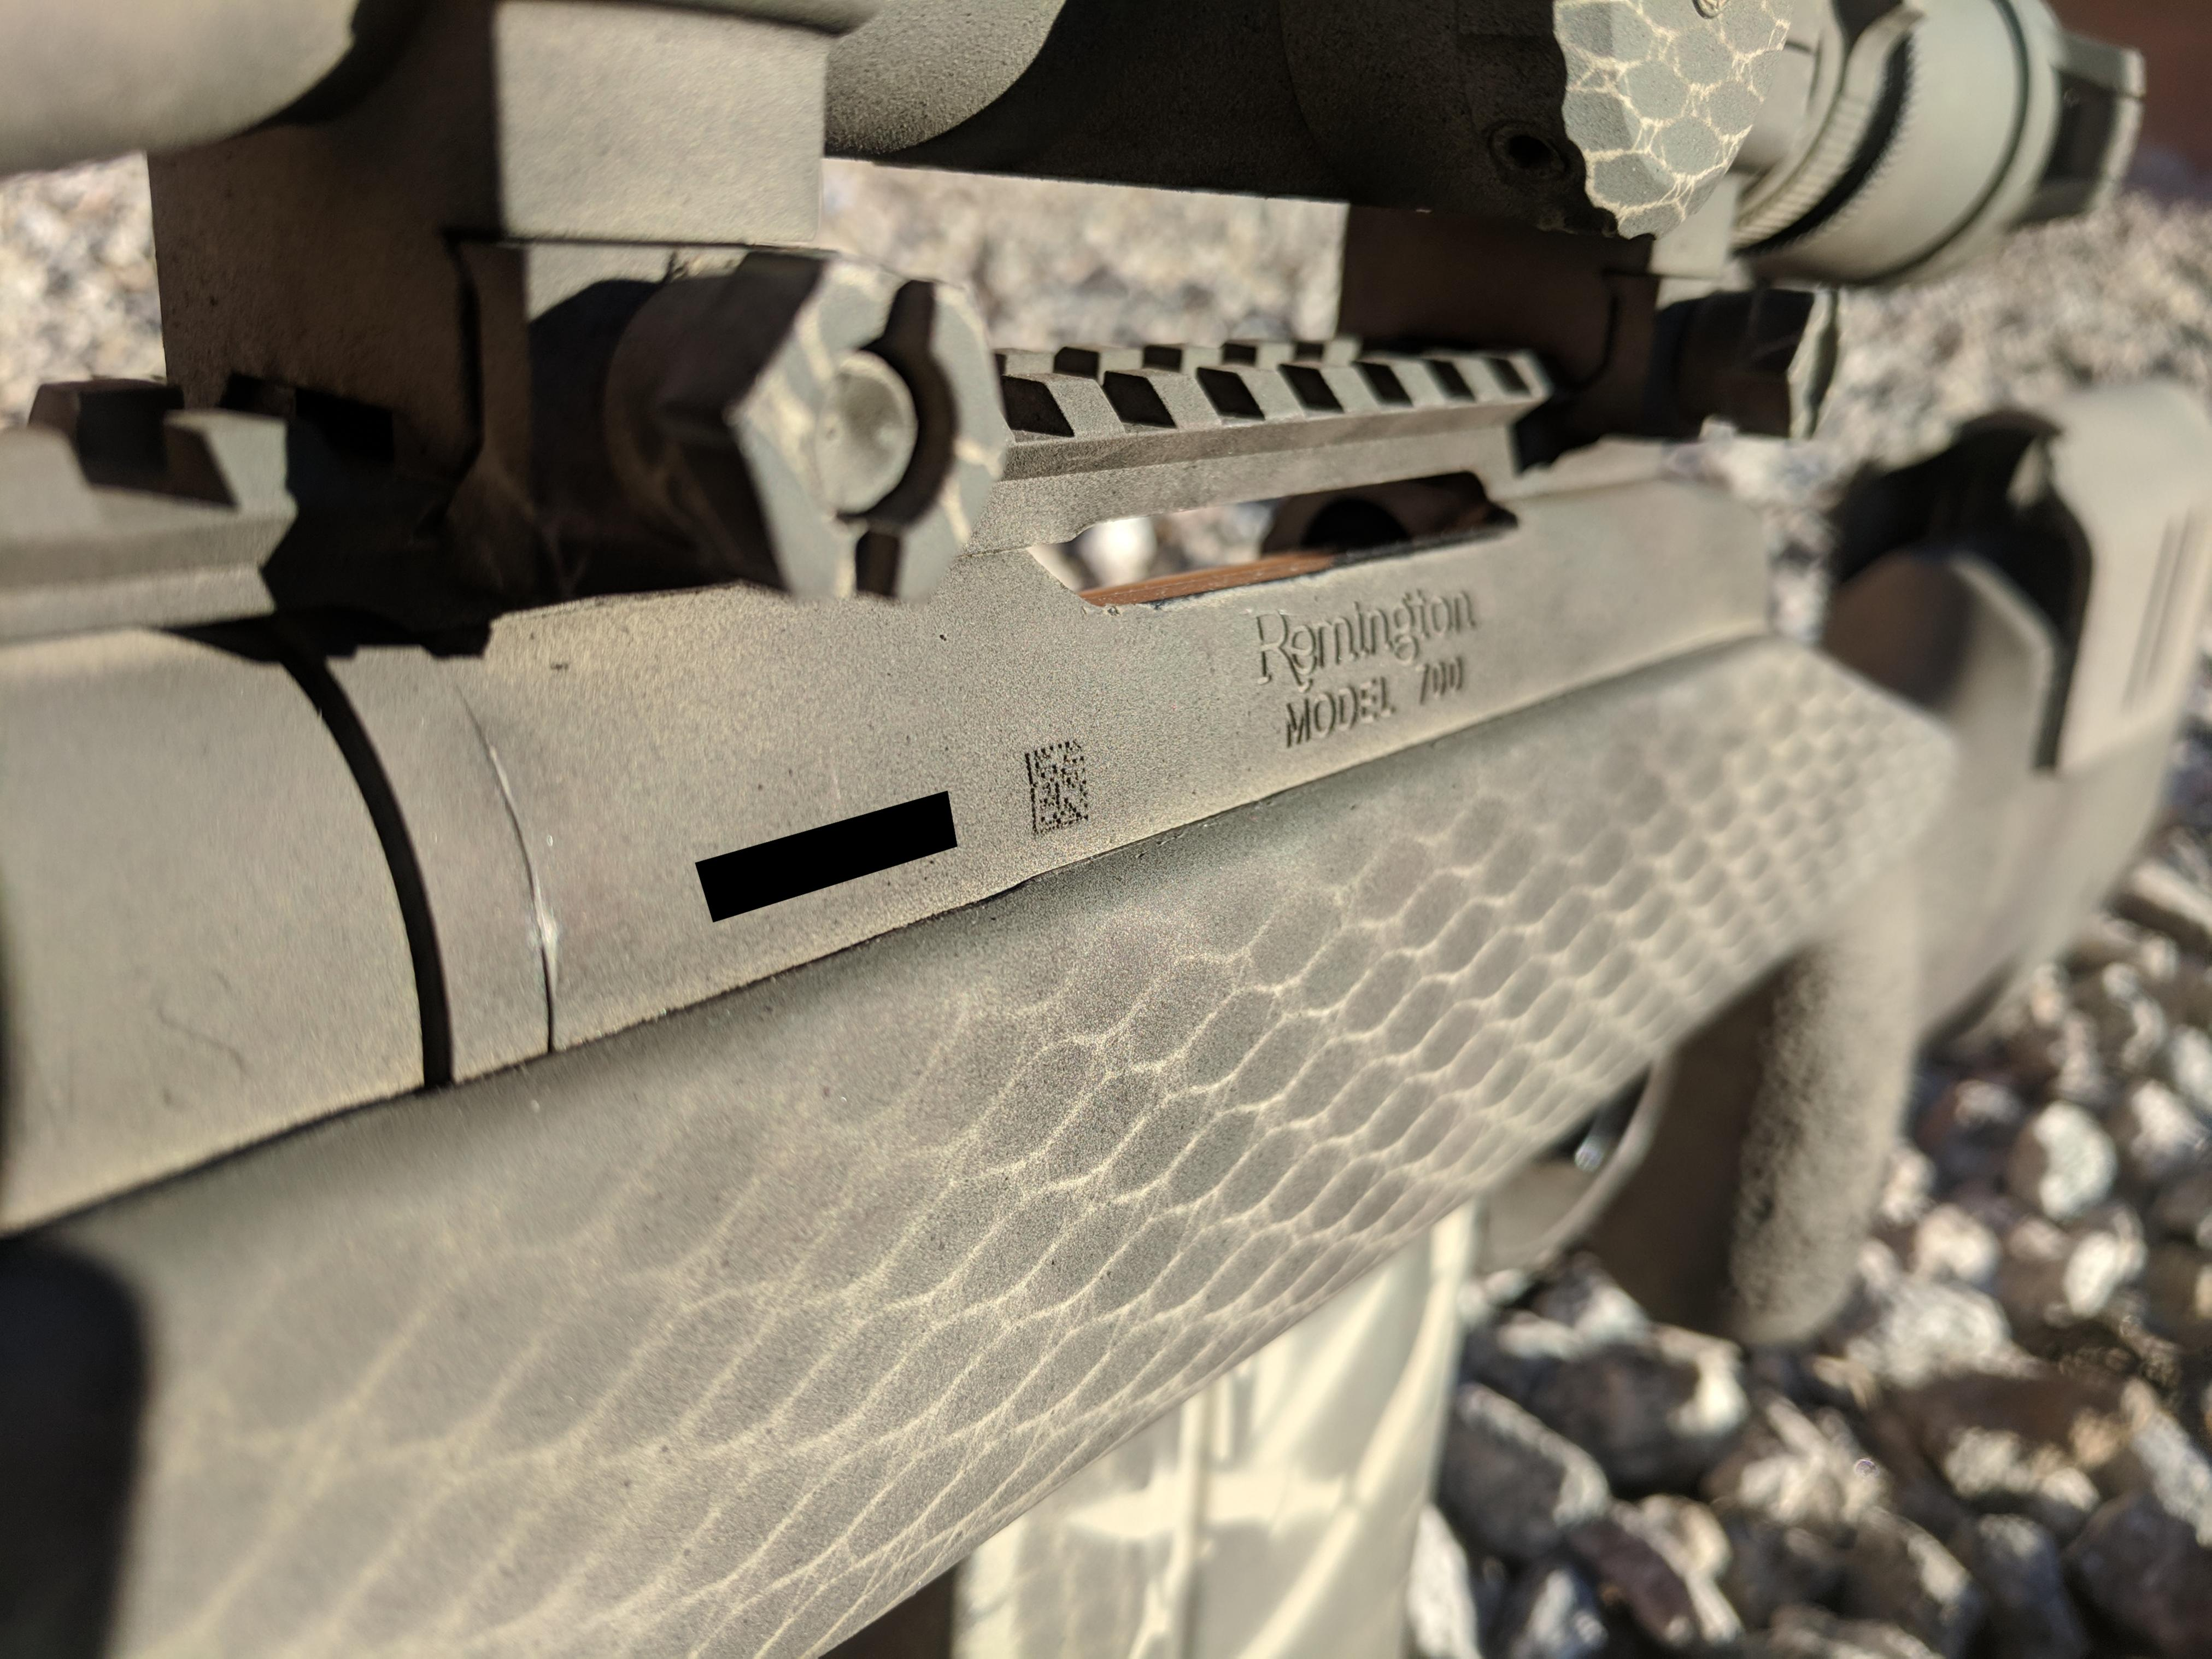 HK91 in Desert Camo-m40-3.jpg